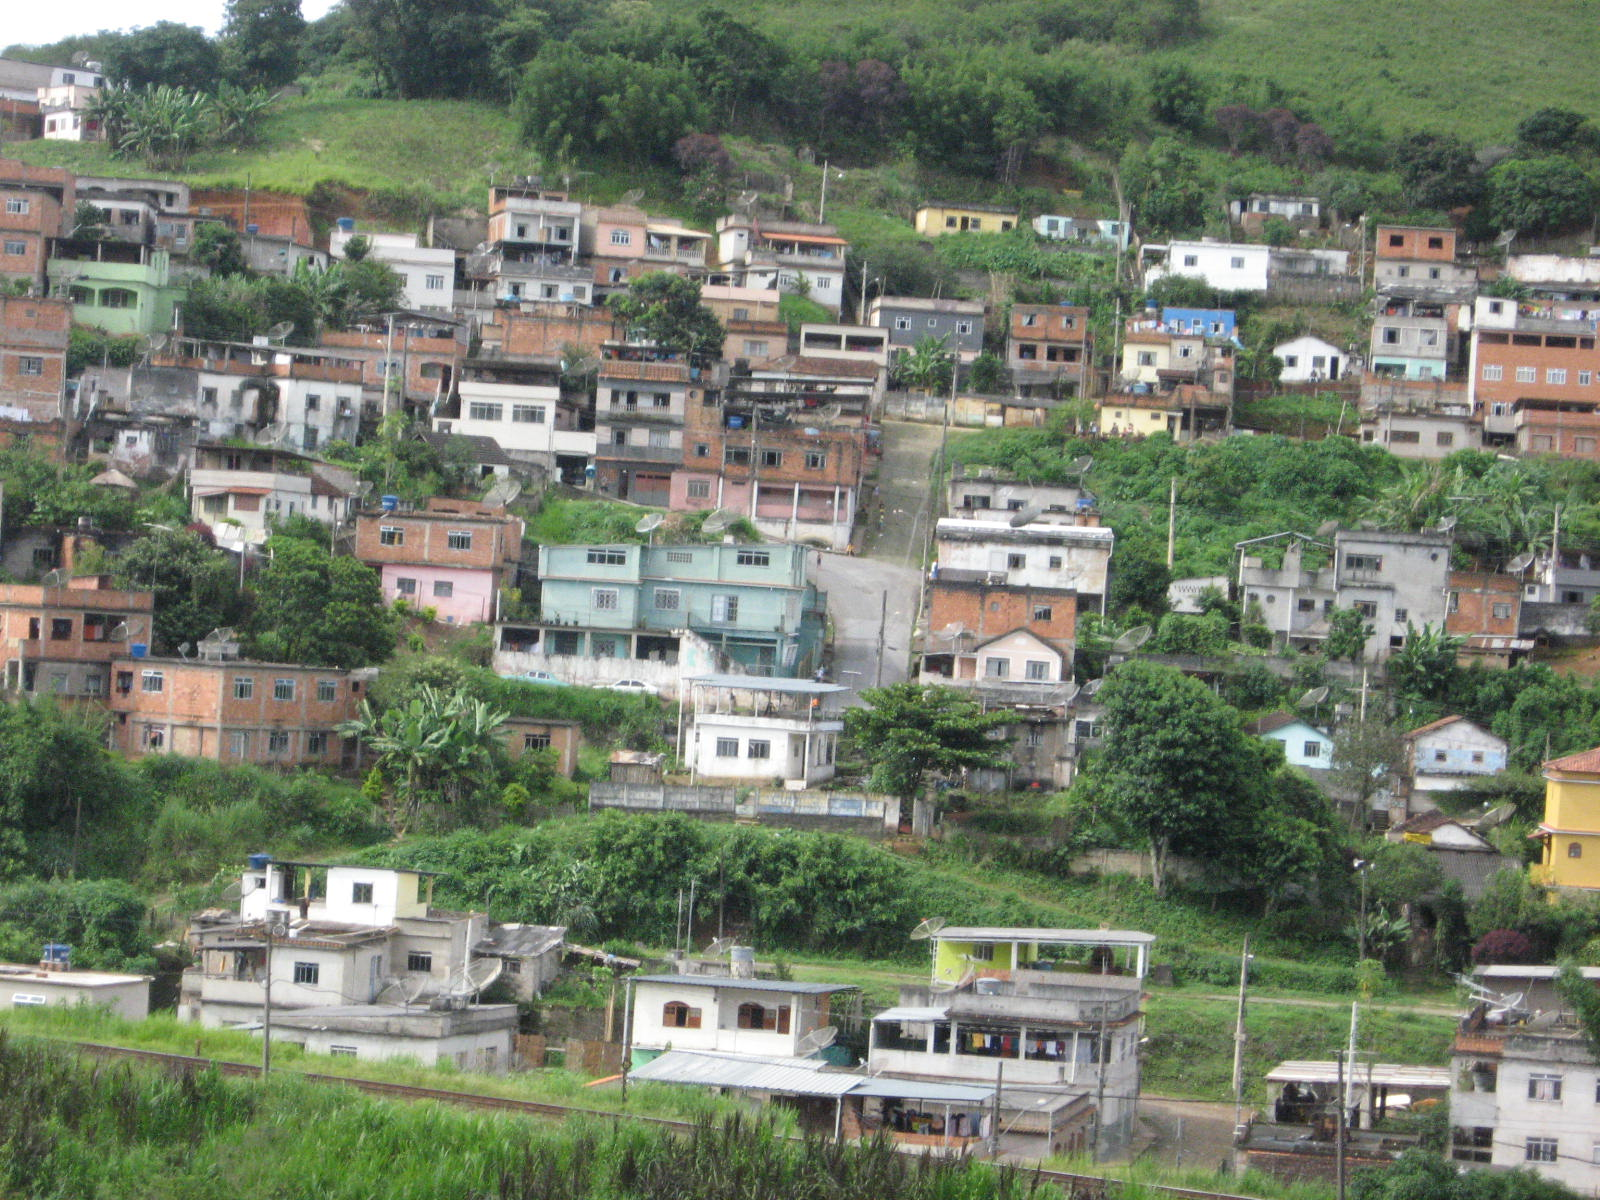 Santos Dumont Minas Gerais fonte: upload.wikimedia.org